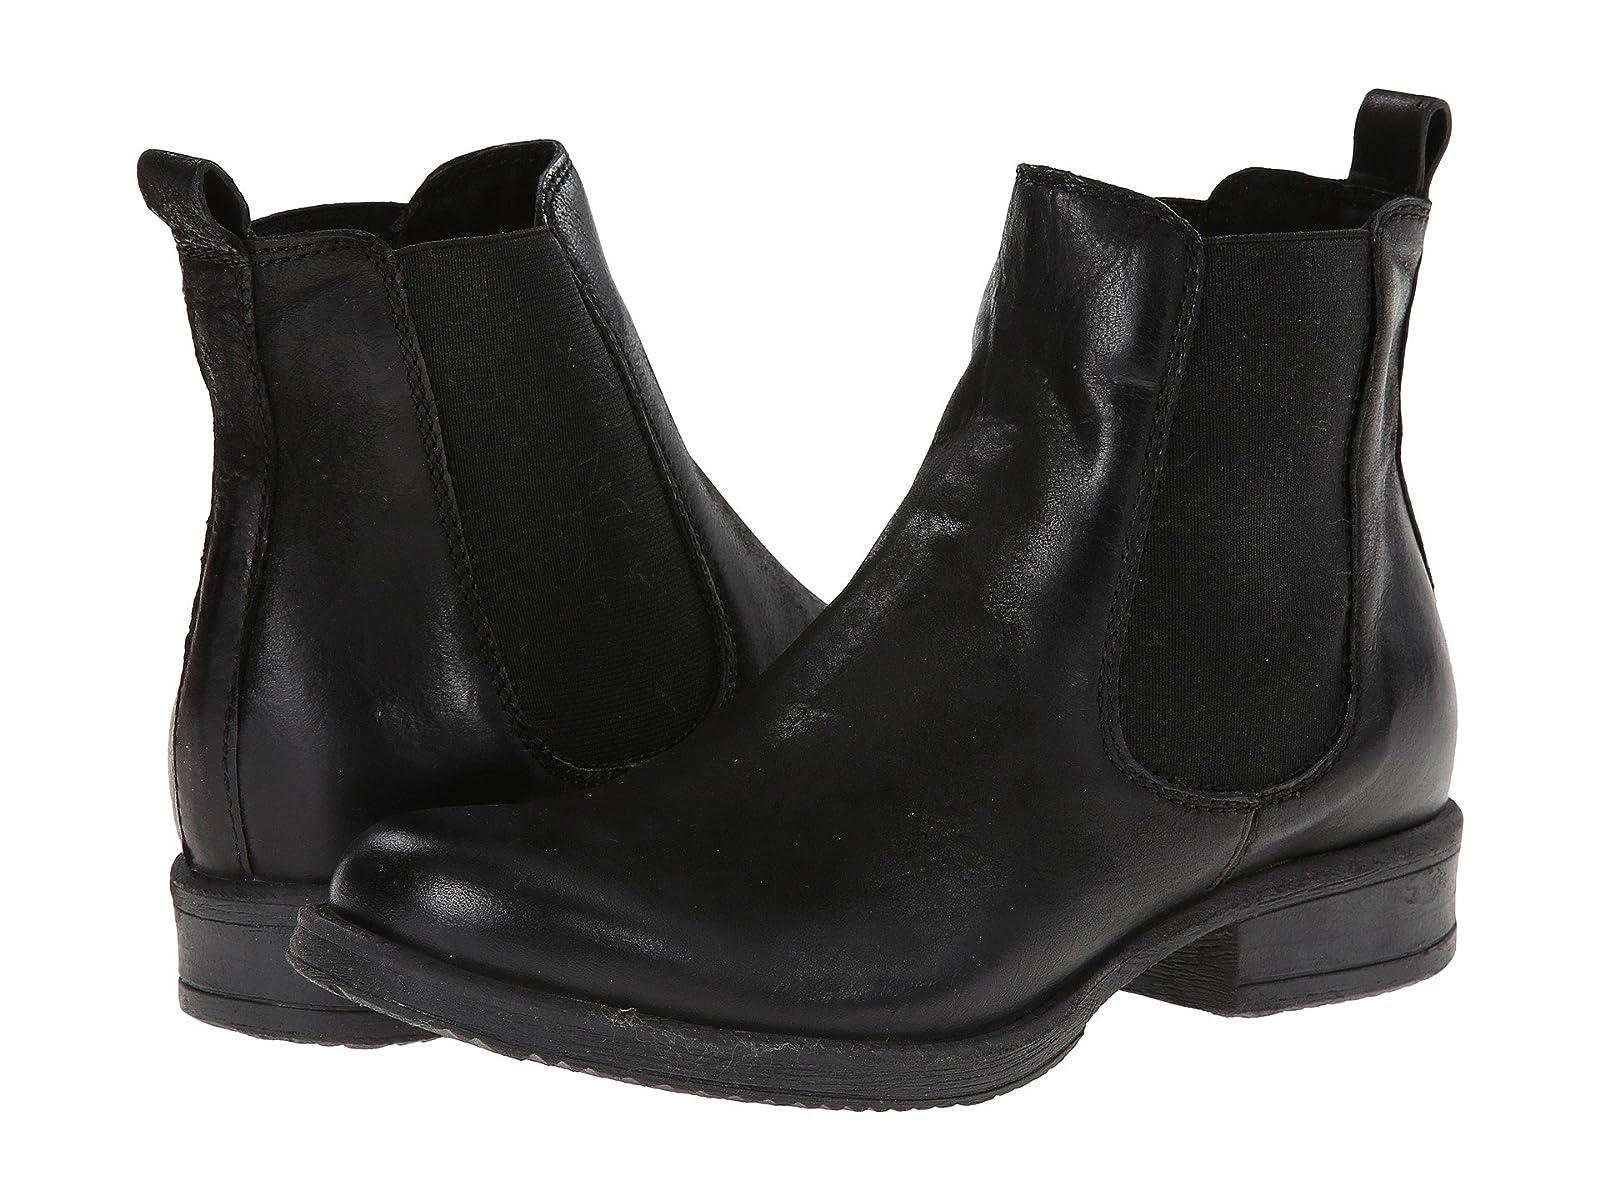 Miz Mooz NewportEconomical and quality shoes